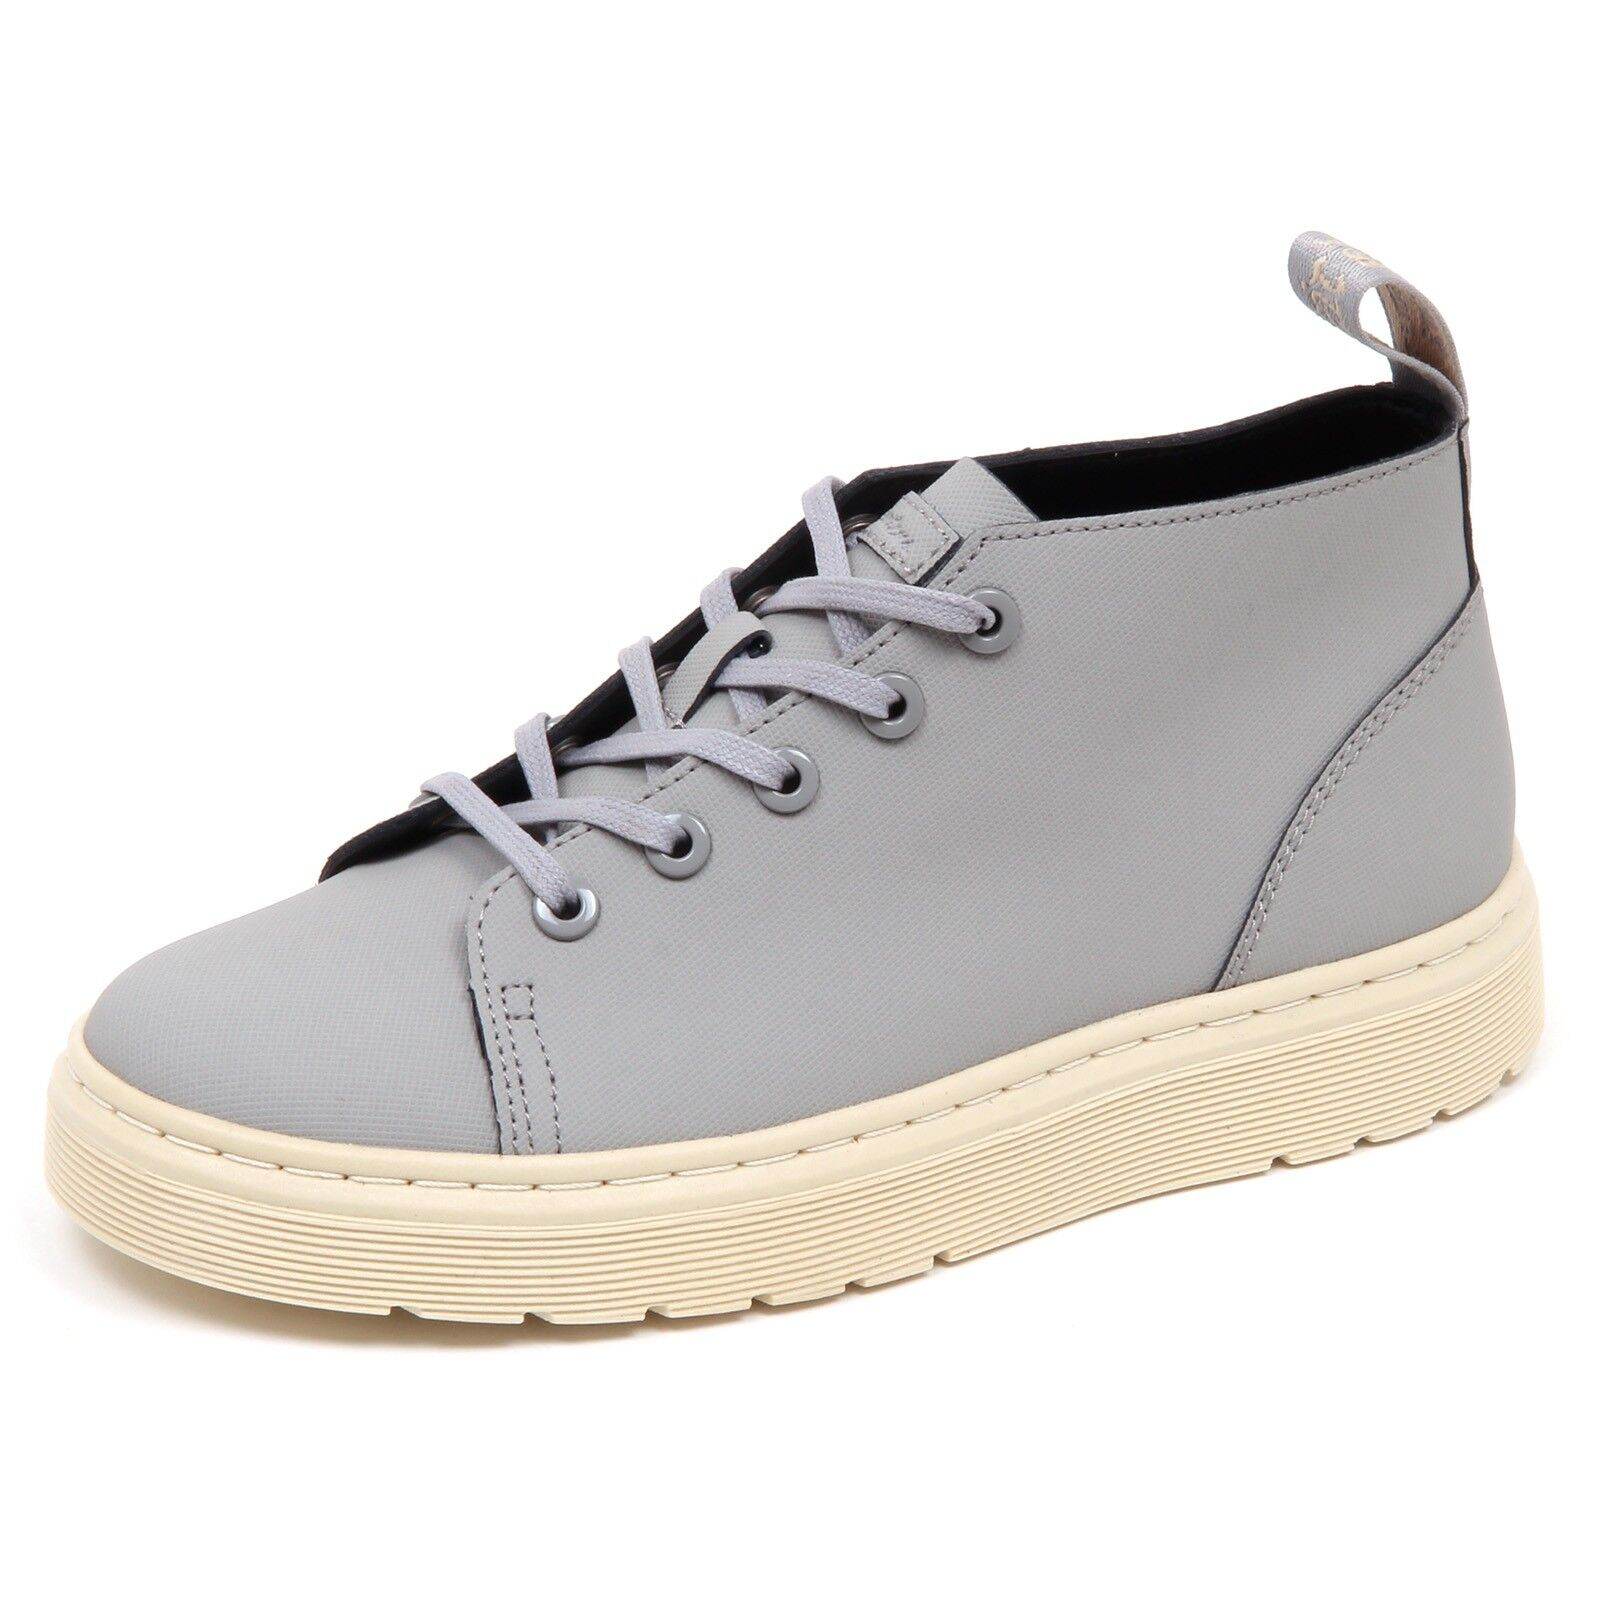 D6720 (SAMPLE NOT FOR RESALE WITHOUT BOX) scarpe da ginnastica donna DR. MARTENS tissue scarpe